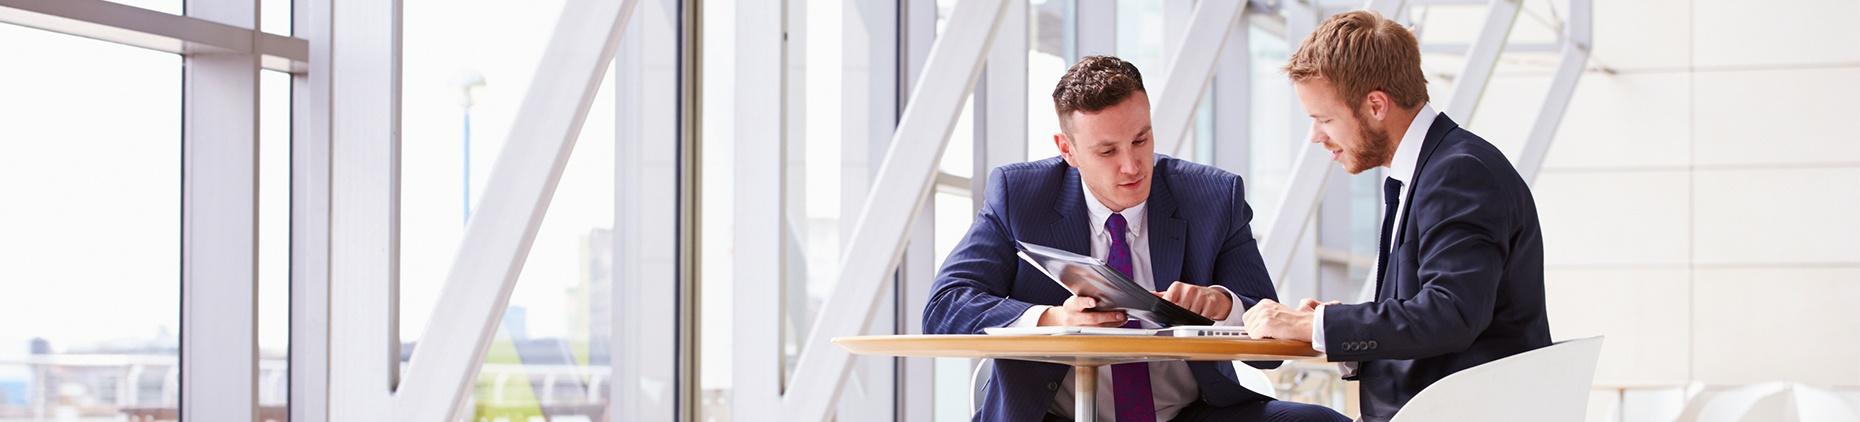 SlideShare: Common Sales Negotiation Mistakes to Avoid